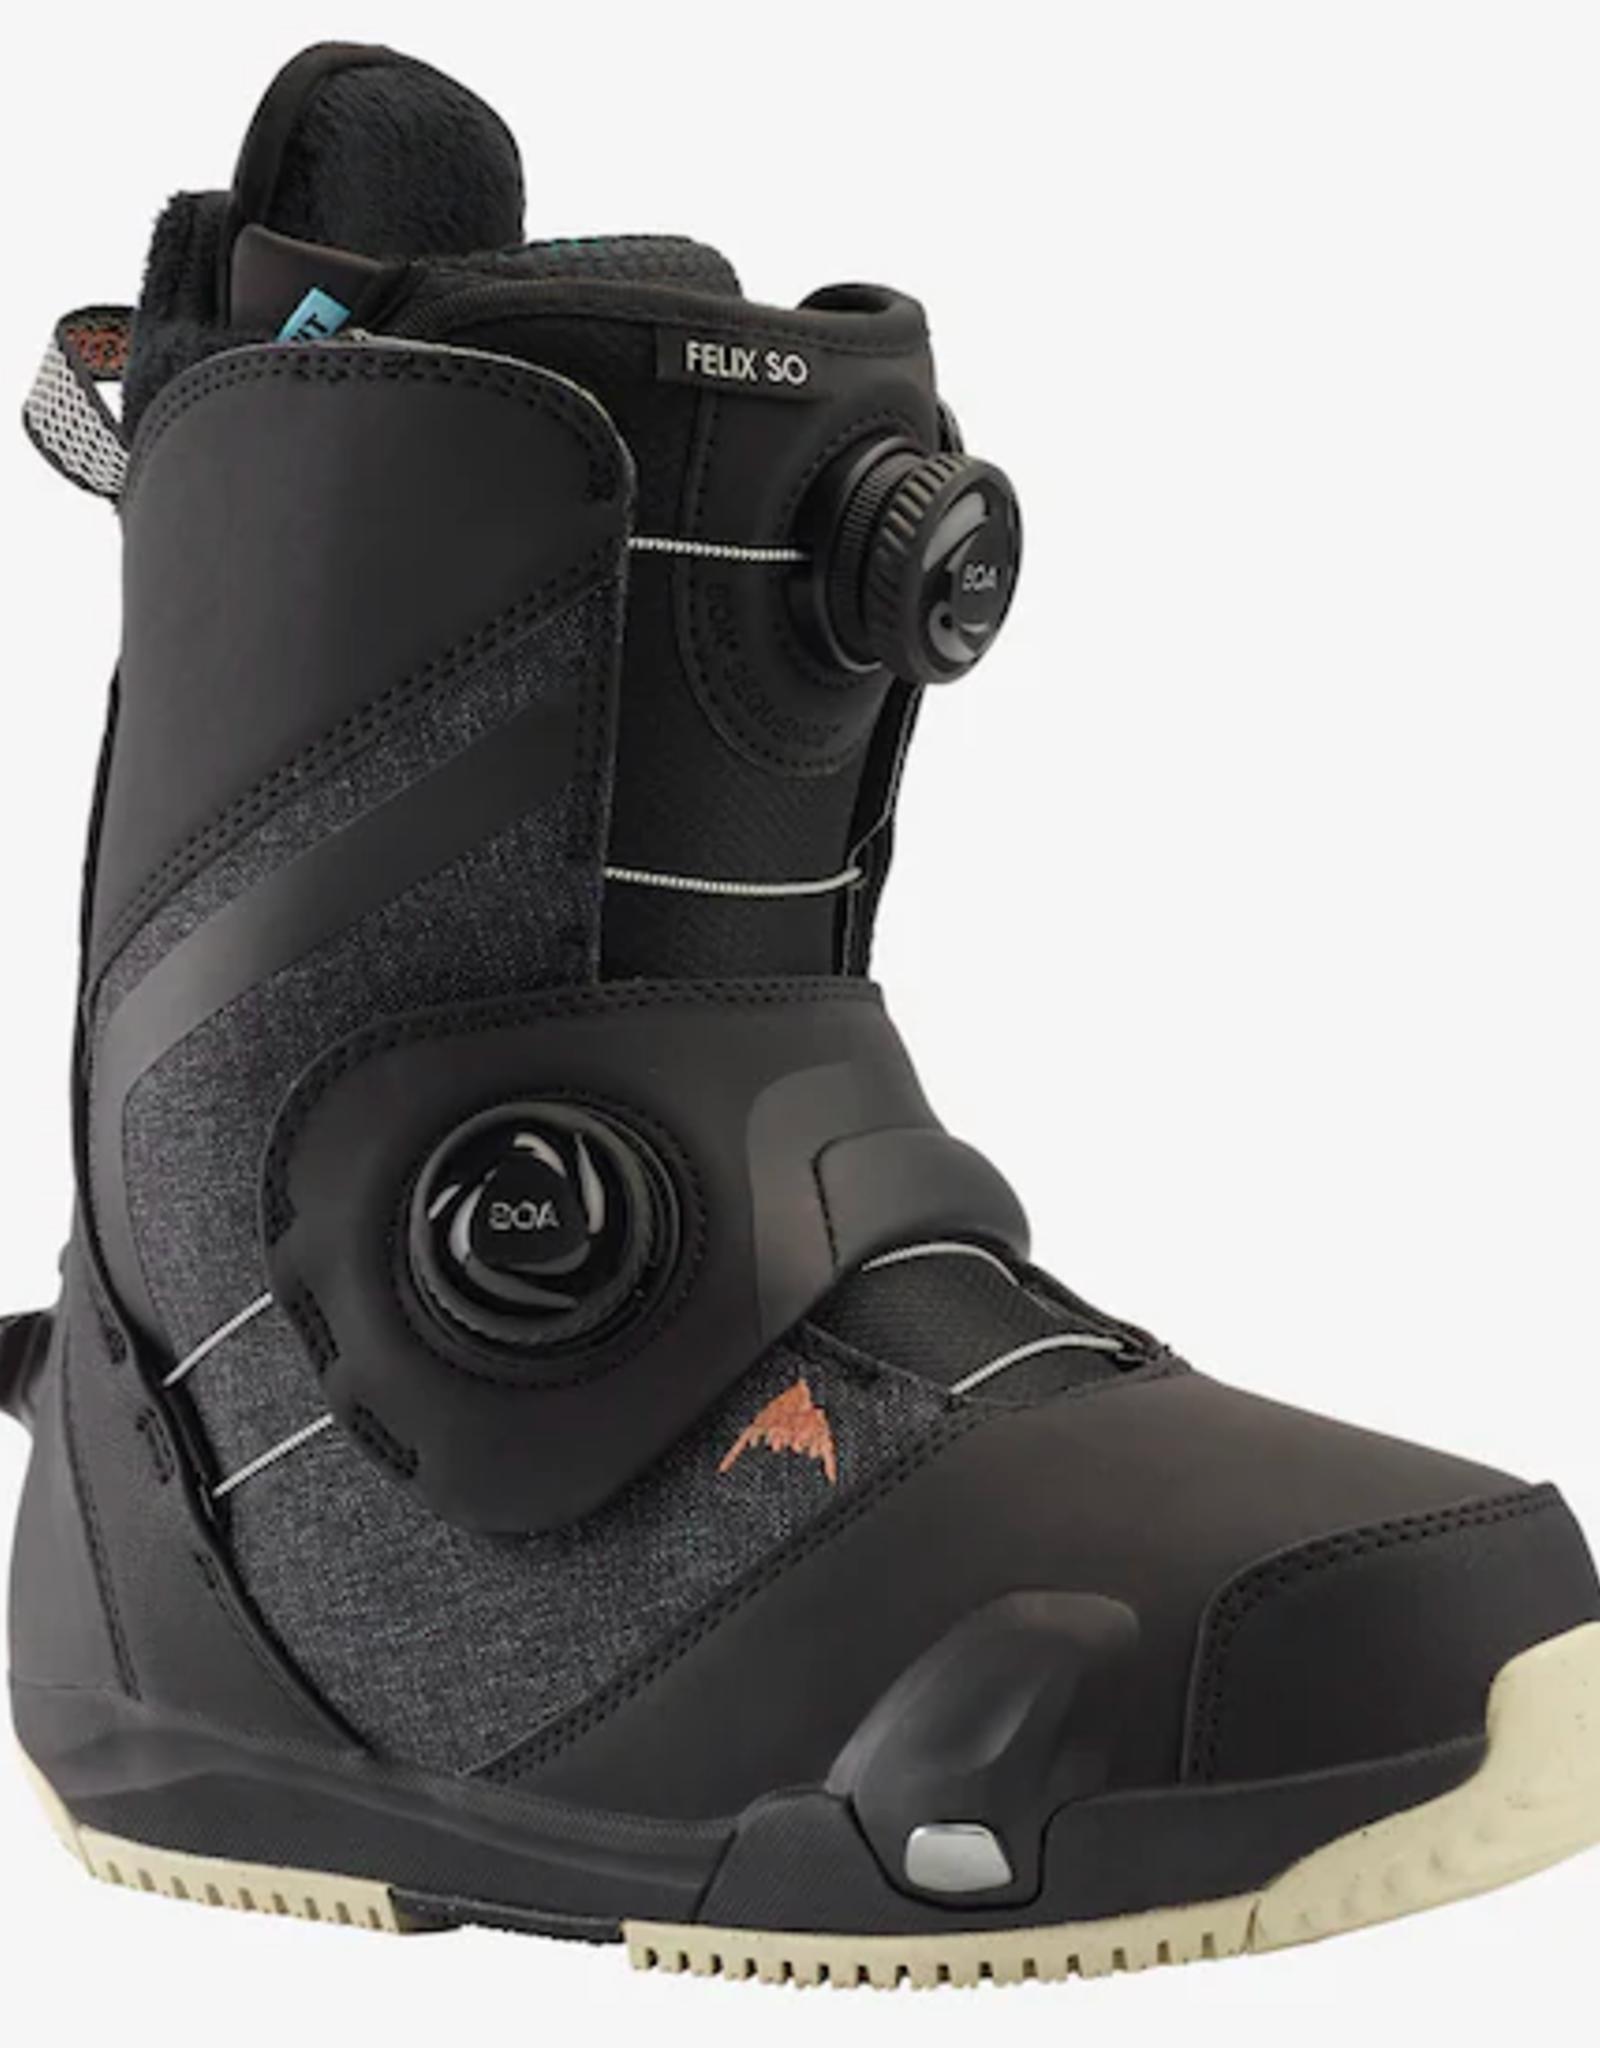 BURTON Burton Women's Felix Step On Snowboard Boots 2021